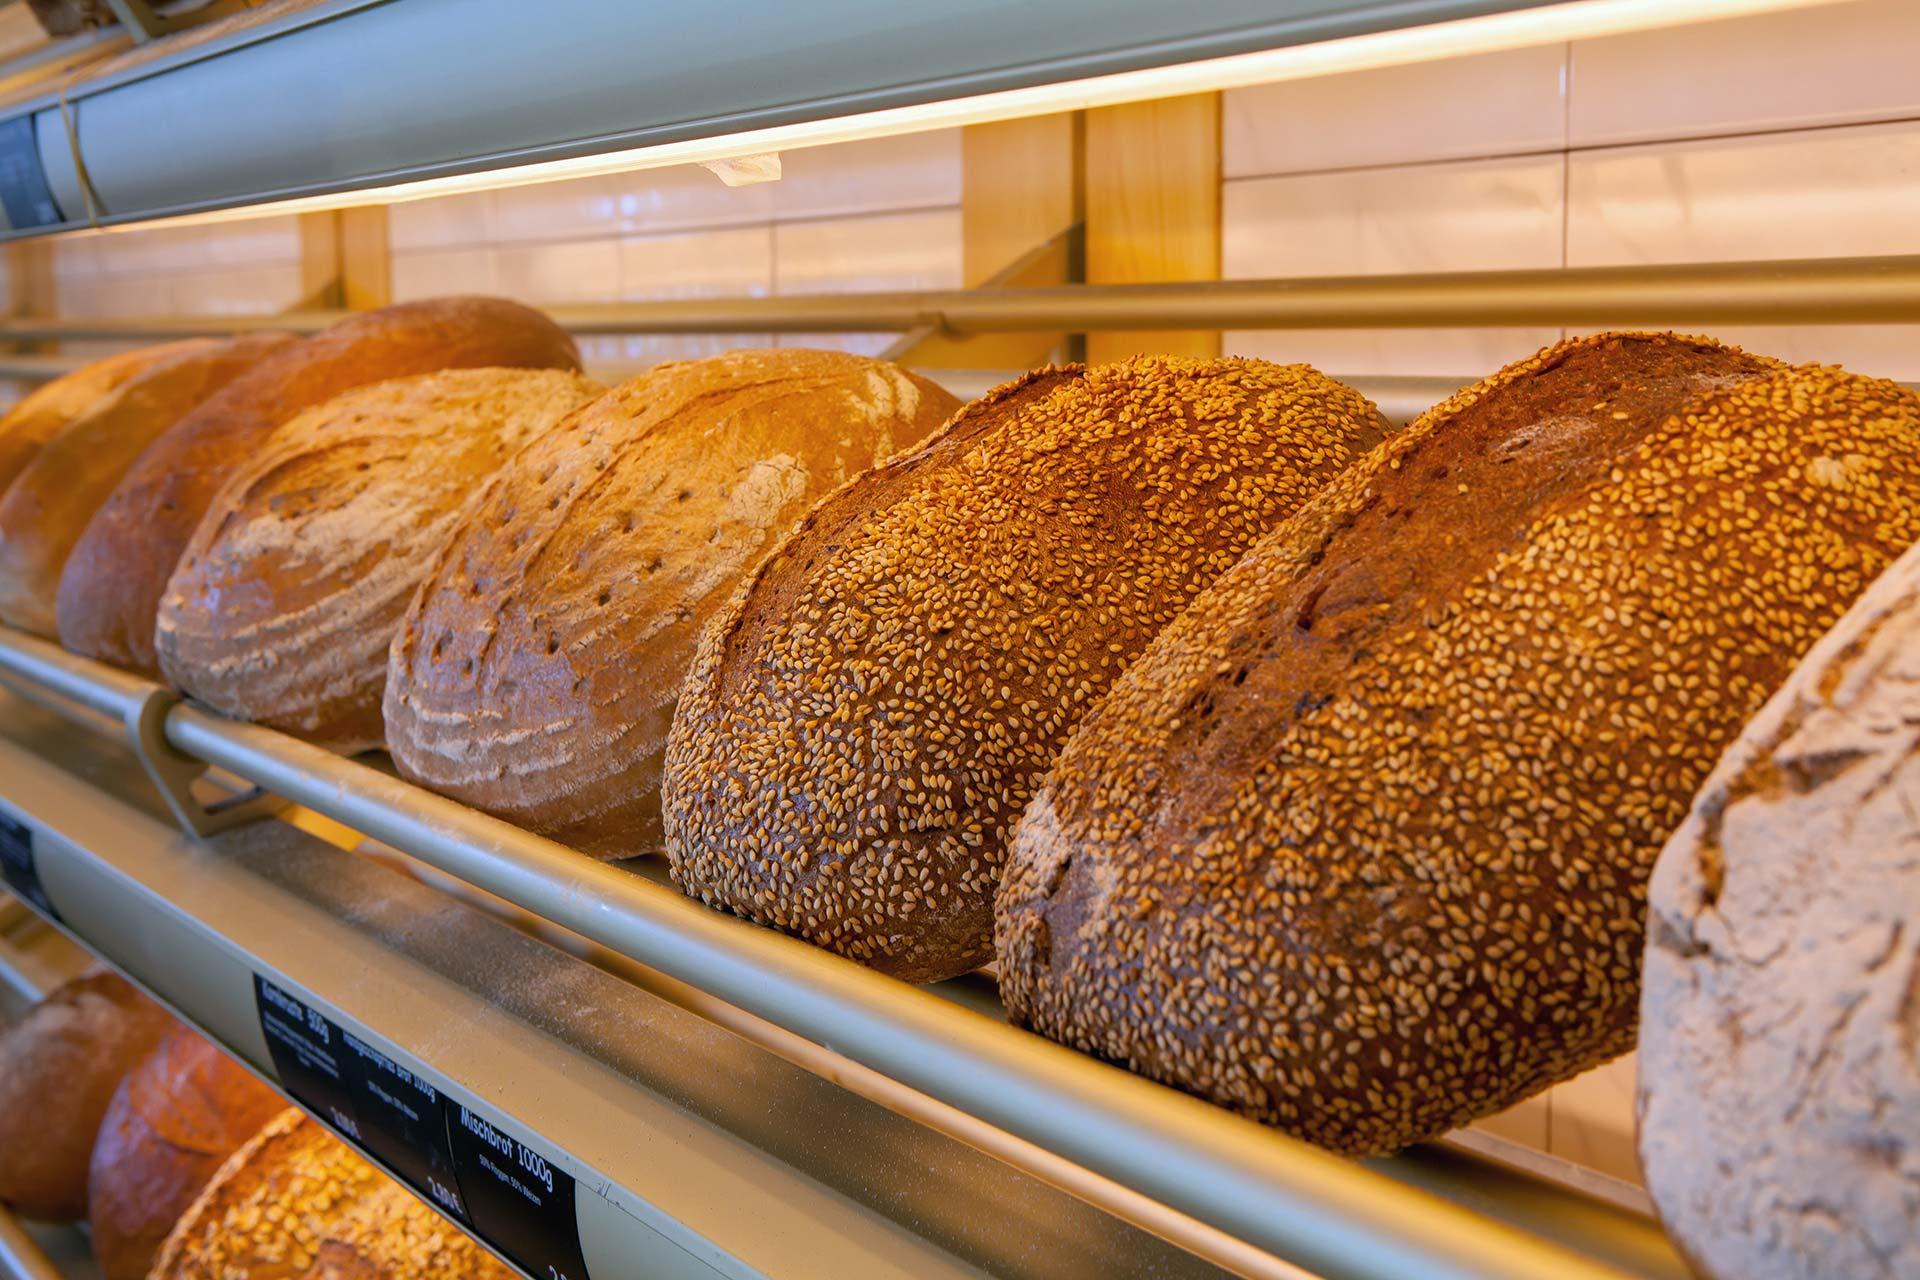 Landbäckerei Koch - Brote in der Bäckerei-Auslage